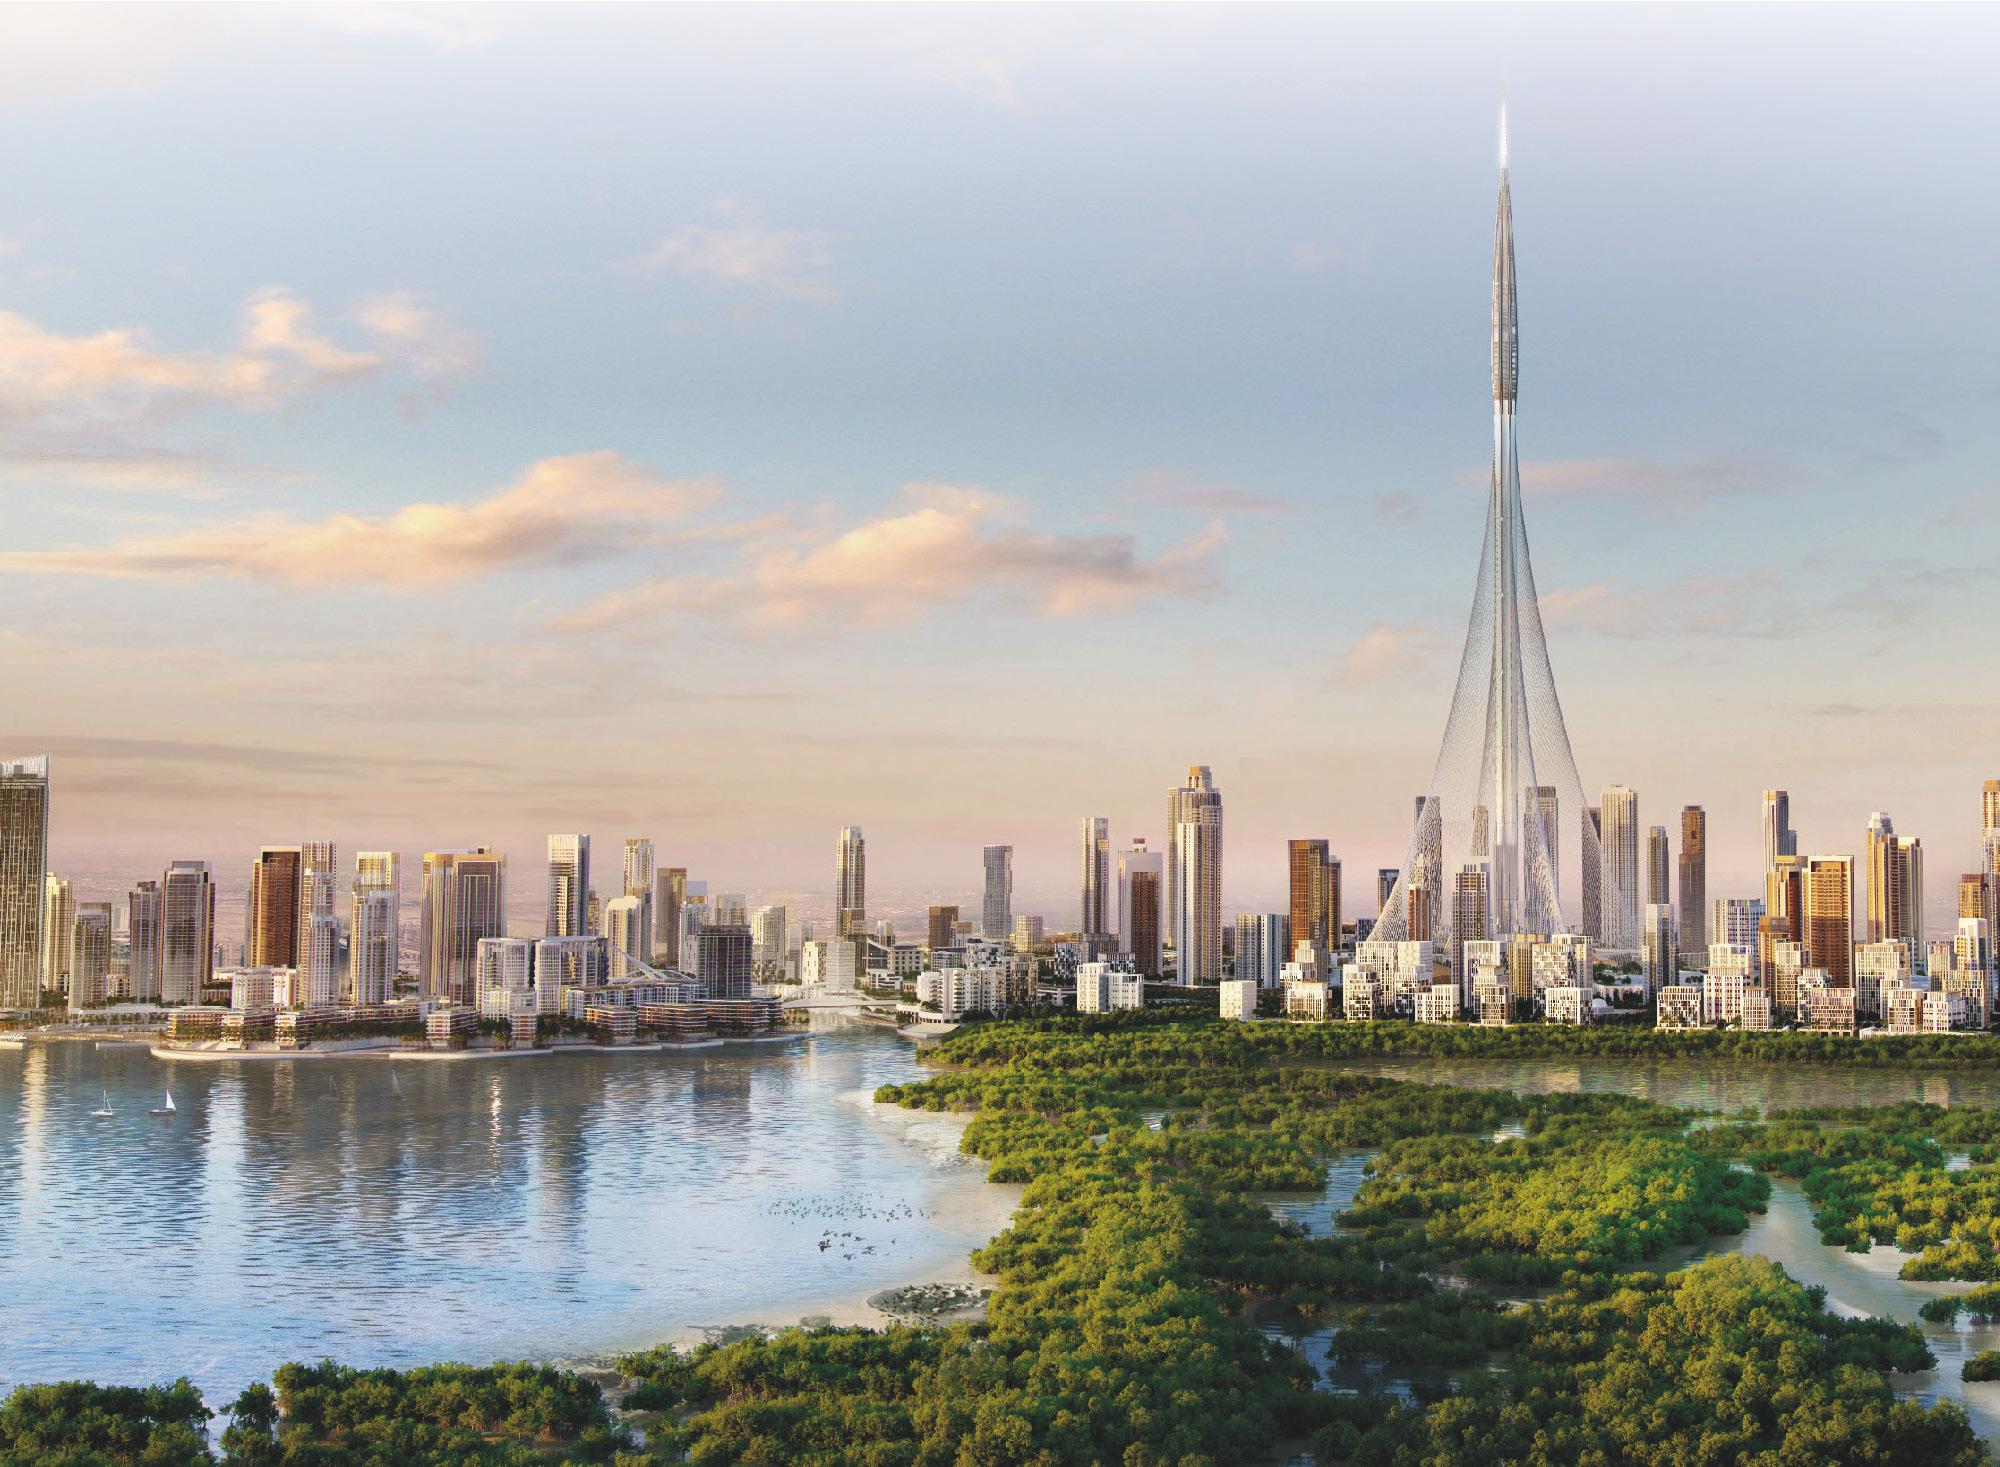 DubaiCreekHarbour_Page_01.jpg